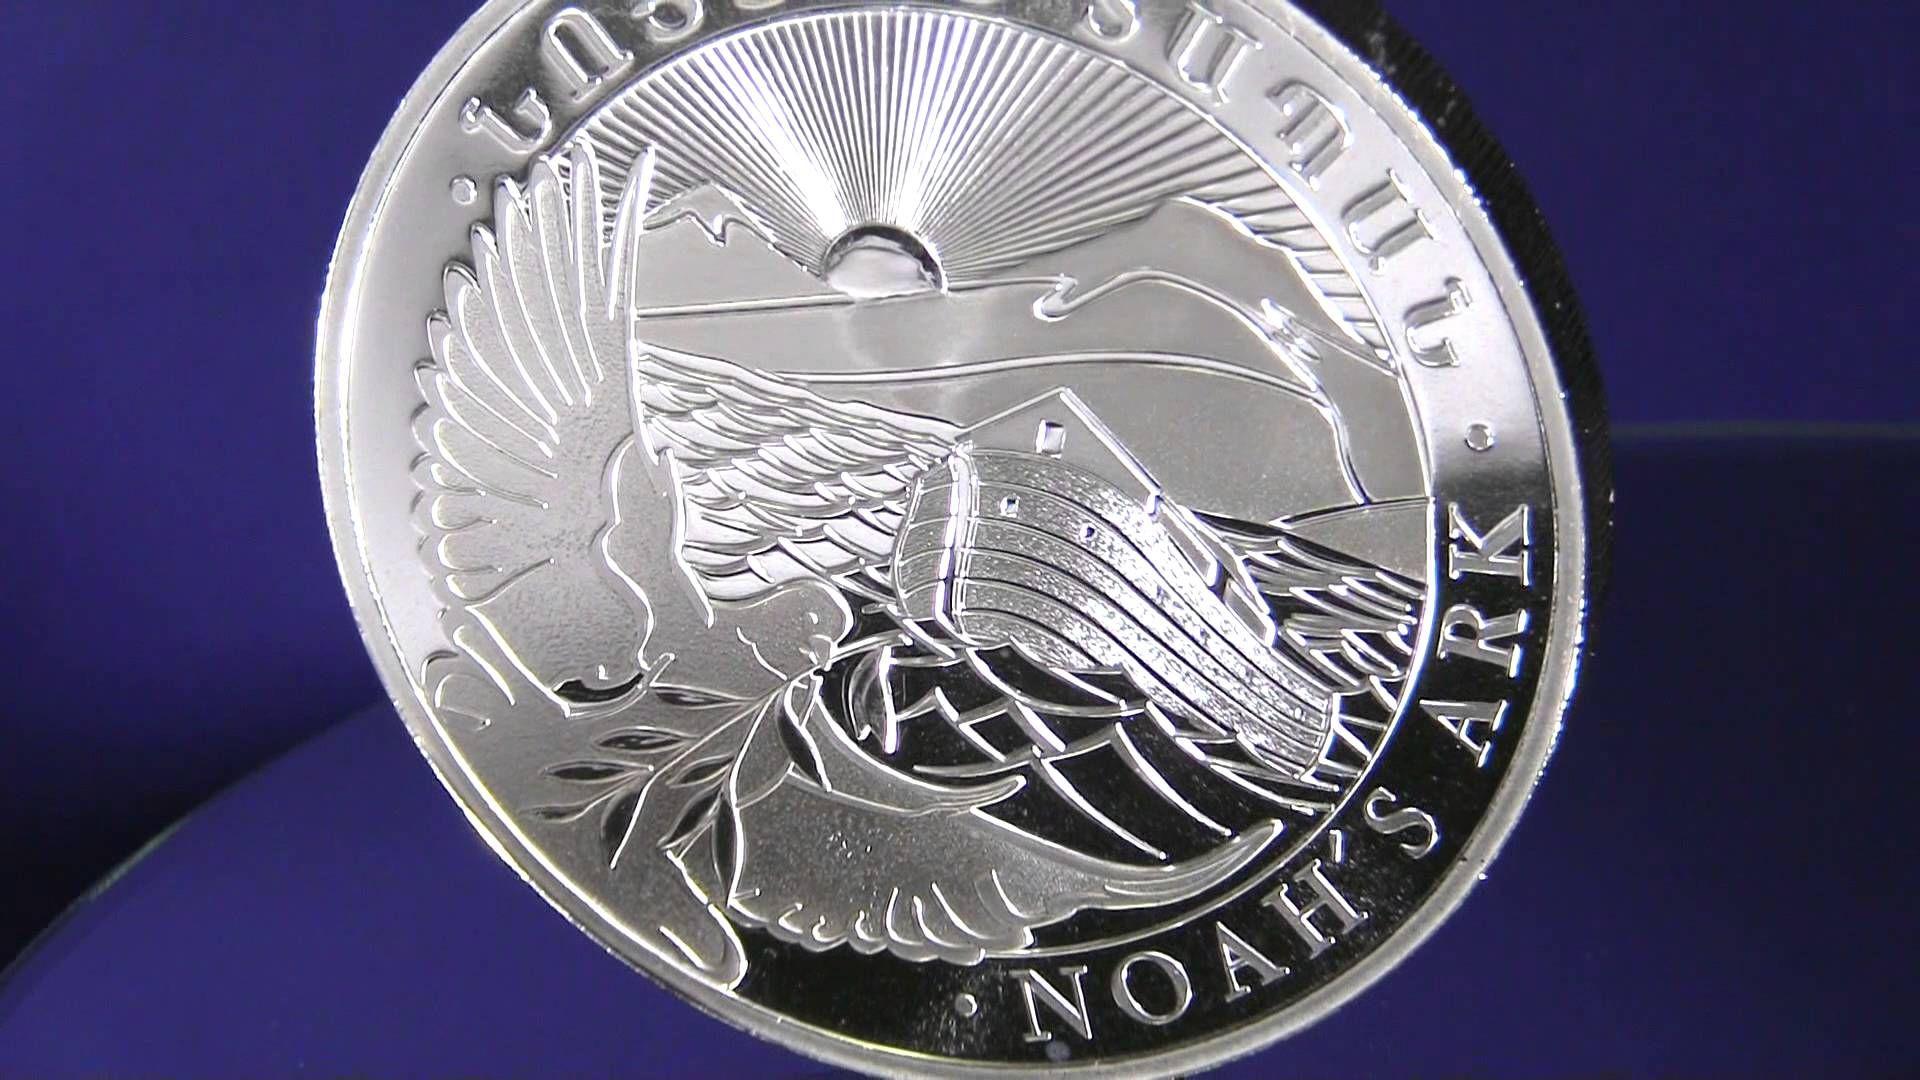 Armenian 2014 10 oz Silver Noah's Ark Coin at Art and Coin TV